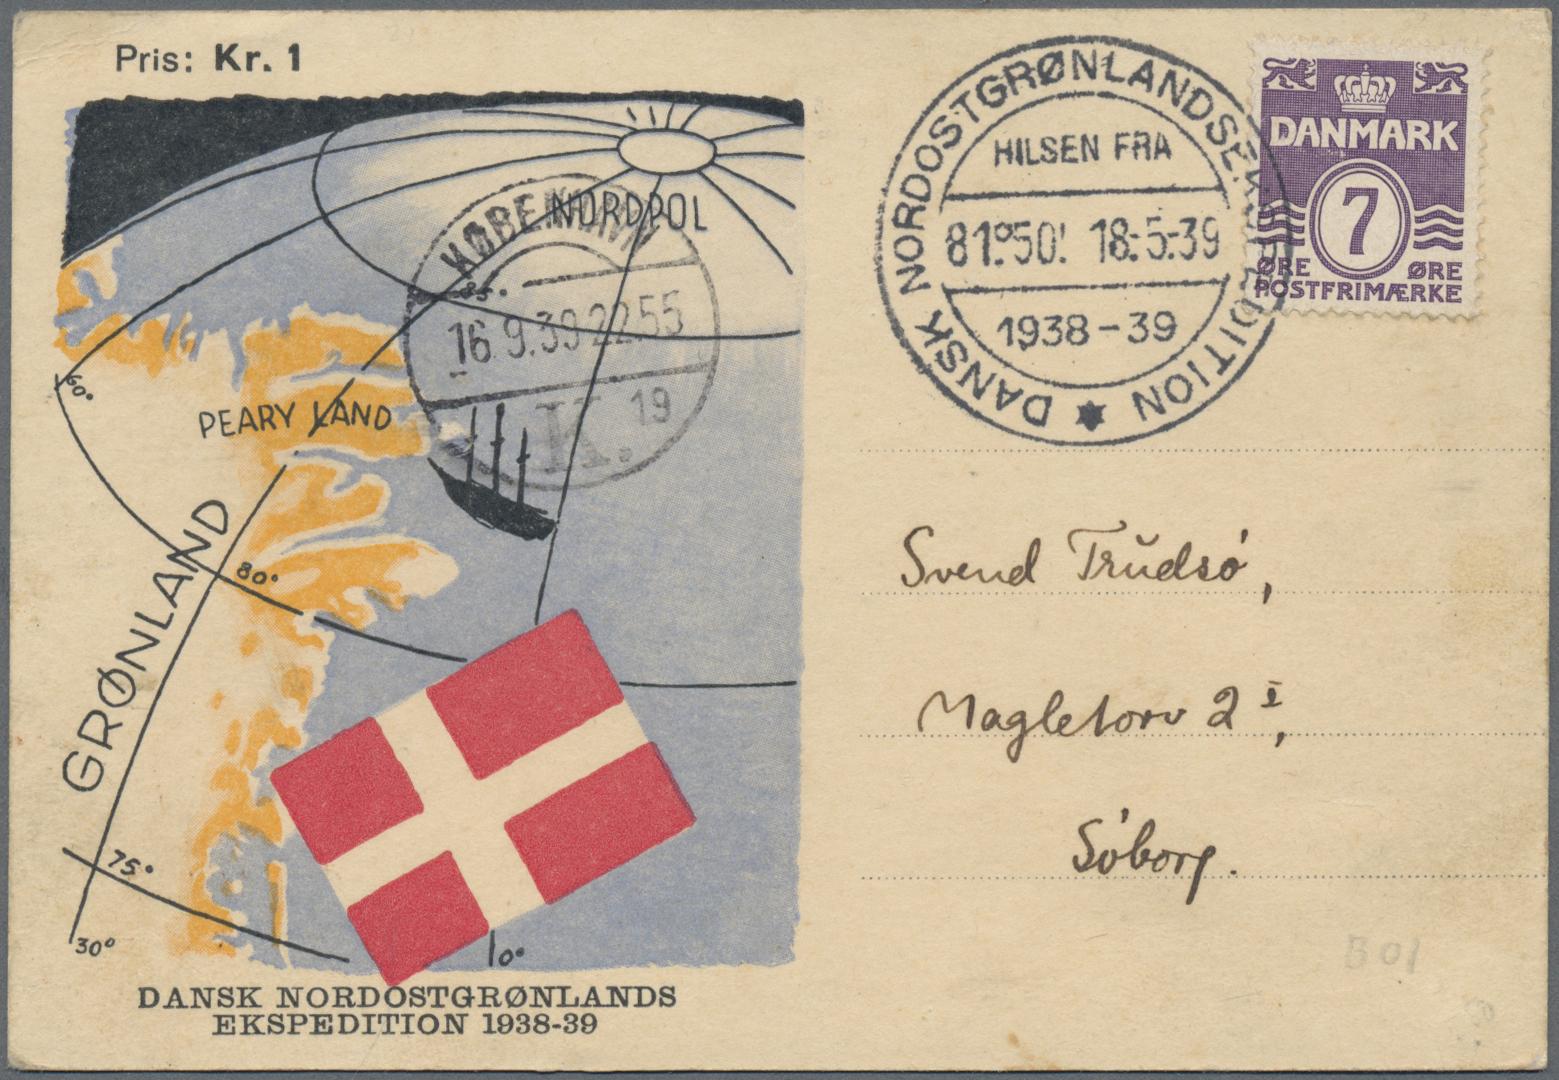 Lot 11106 - Dänemark - Grönland  -  Auktionshaus Christoph Gärtner GmbH & Co. KG 51th Auction - Day 4